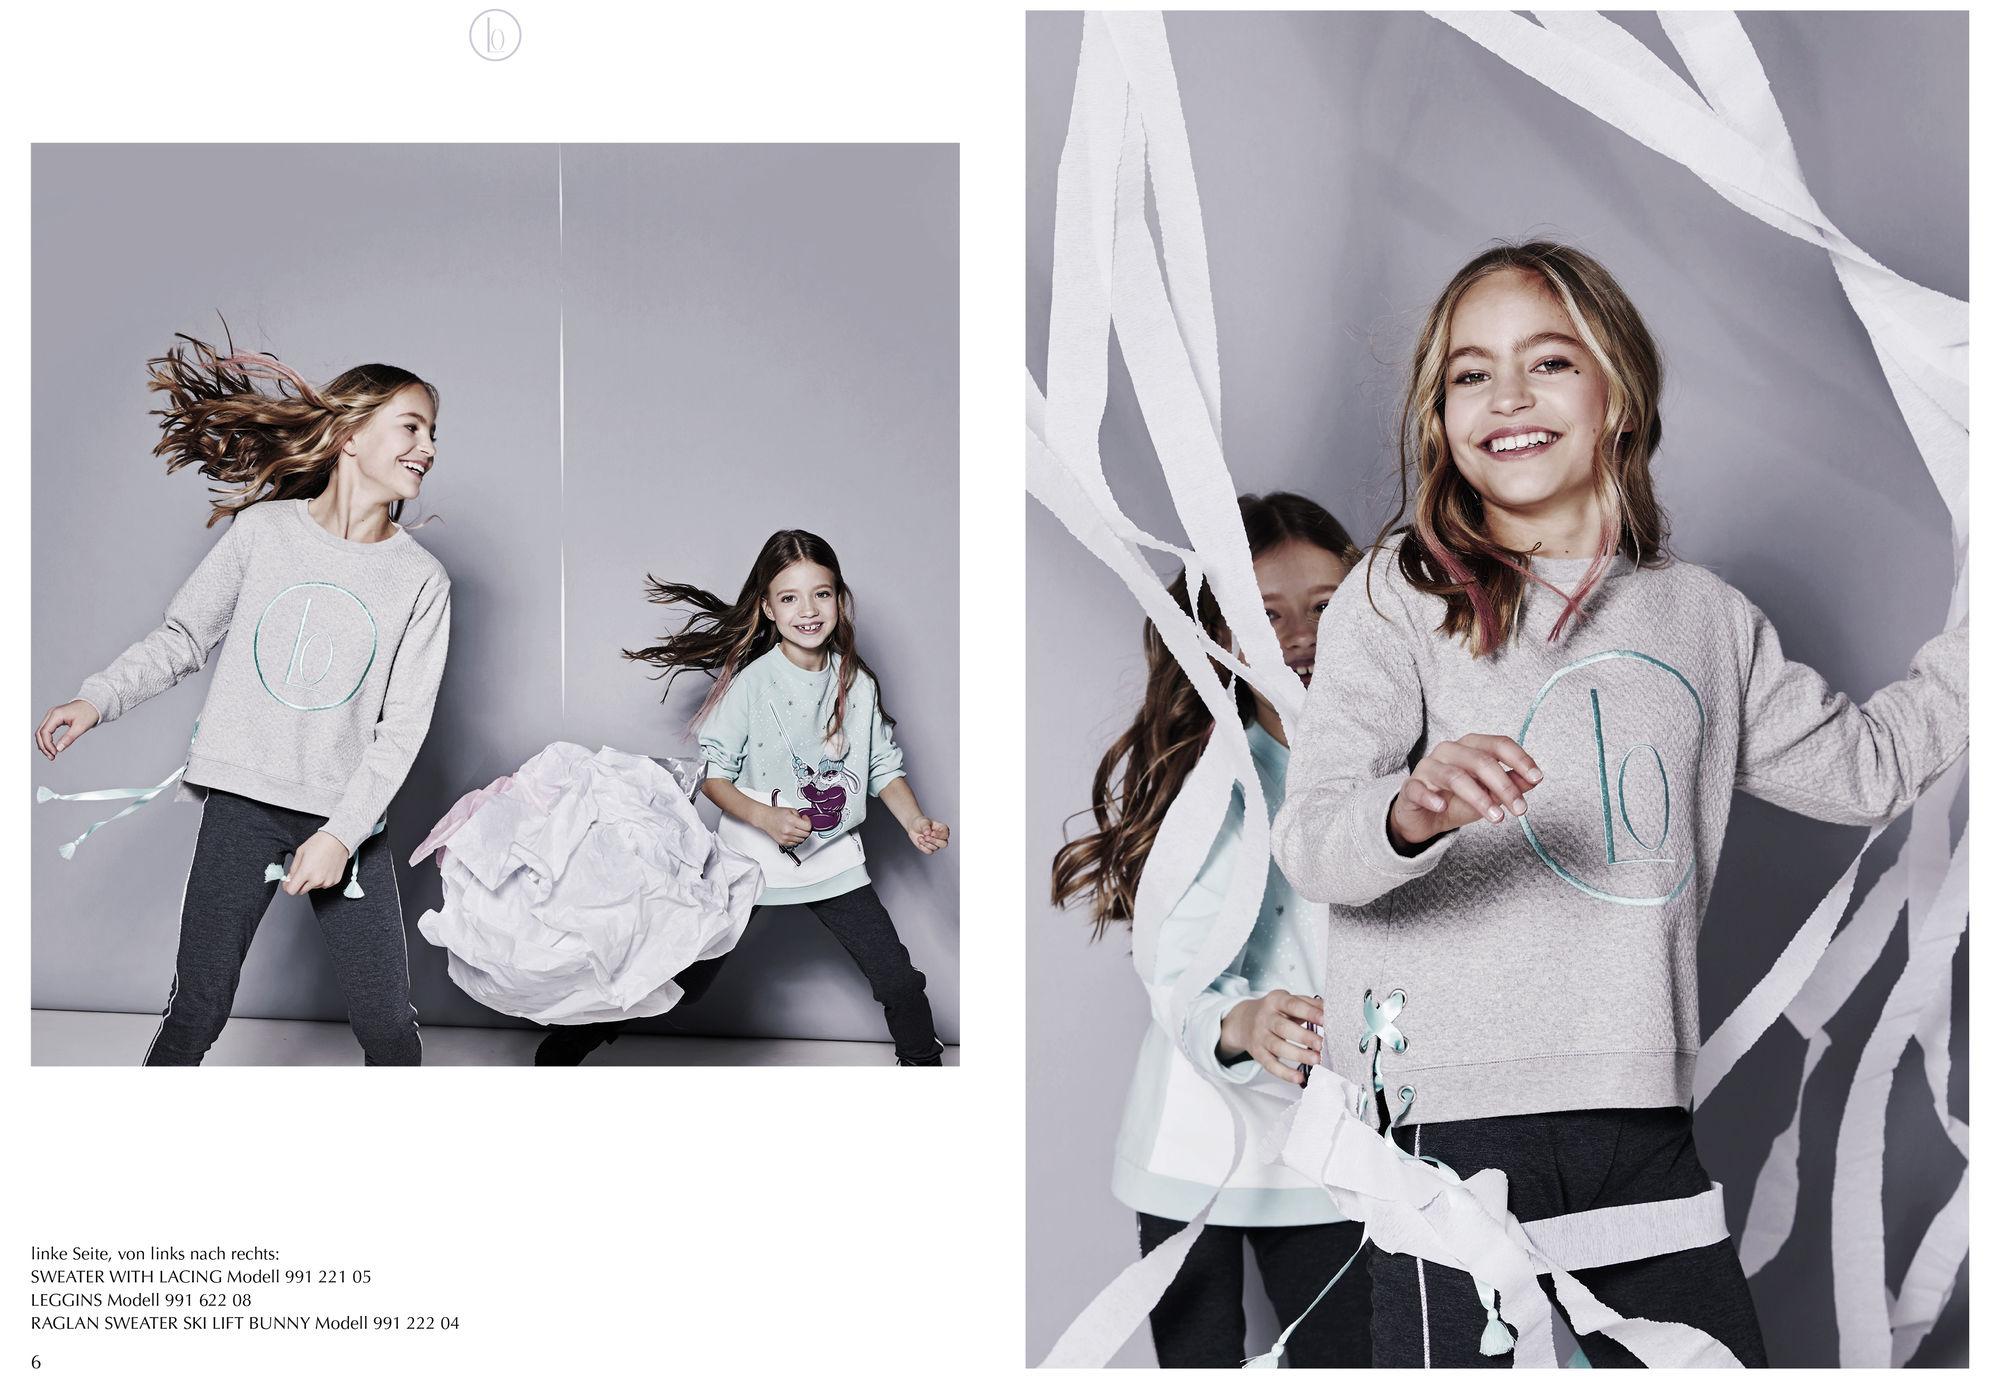 SABINE DUERICHEN c/o Kristina Korb GmbH